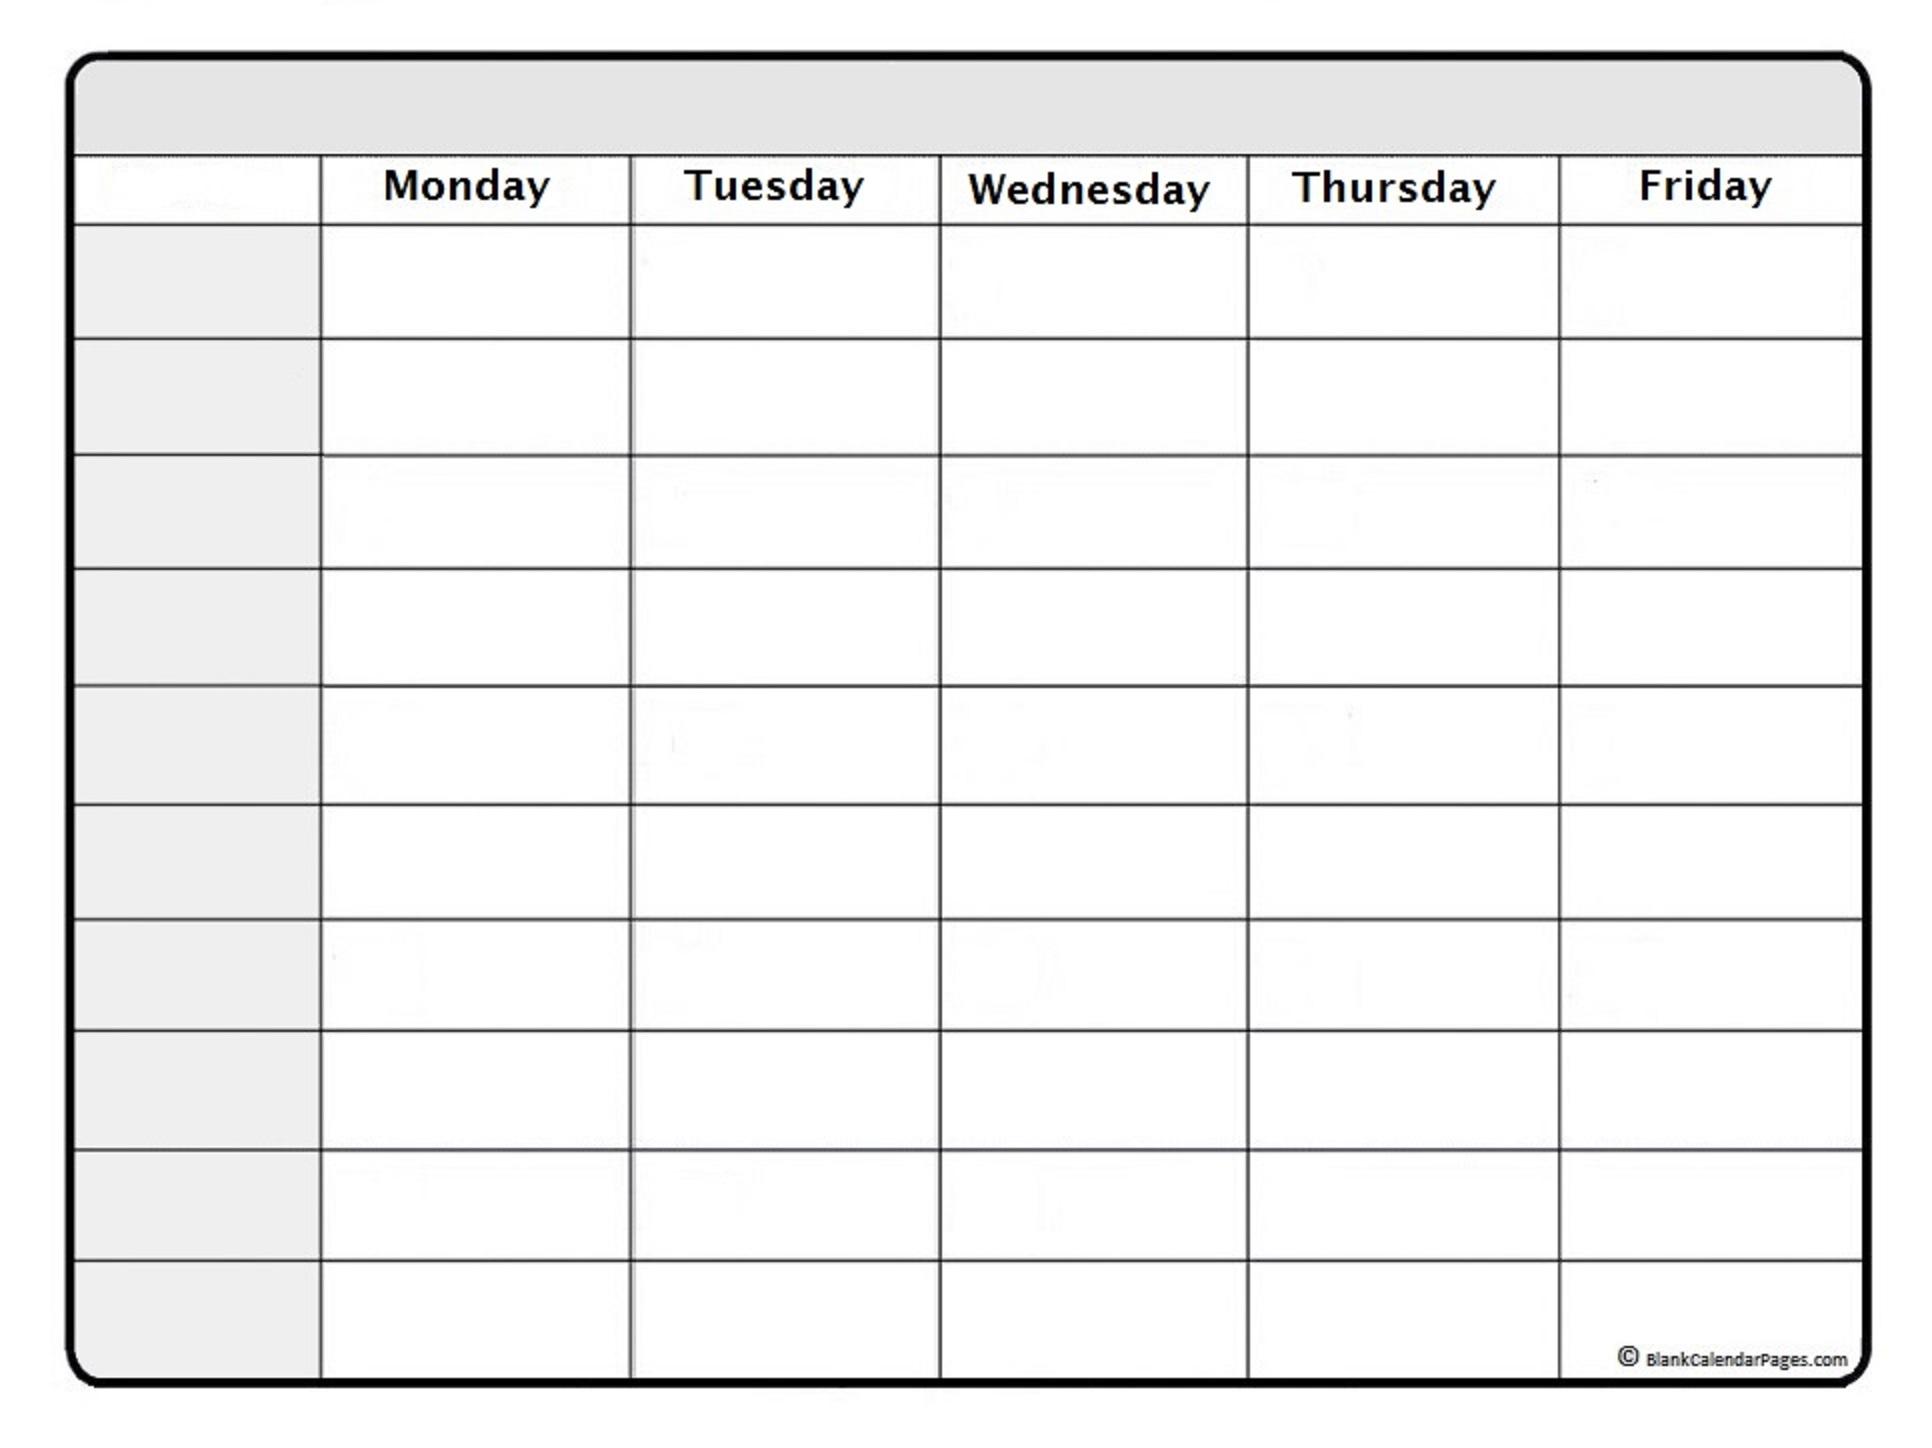 August 2019 Weekly Calendar | August 2019 Weekly Calendar Template with Free Printable Weekly Blank Calendar